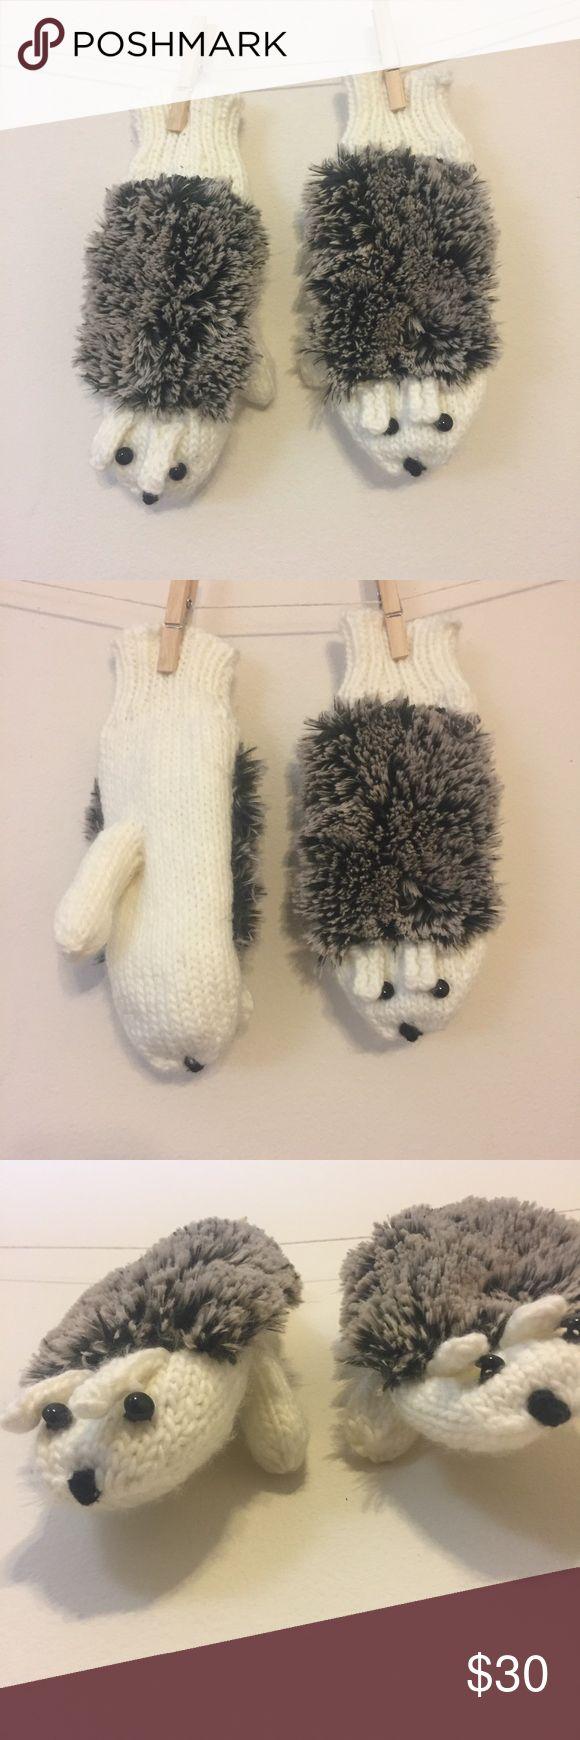 Hedgehog Mittens   NWOT MAKE AN OFFER                                       ⭐️❗️BUNDLES special price❗️⭐️ Accessories Gloves & Mittens